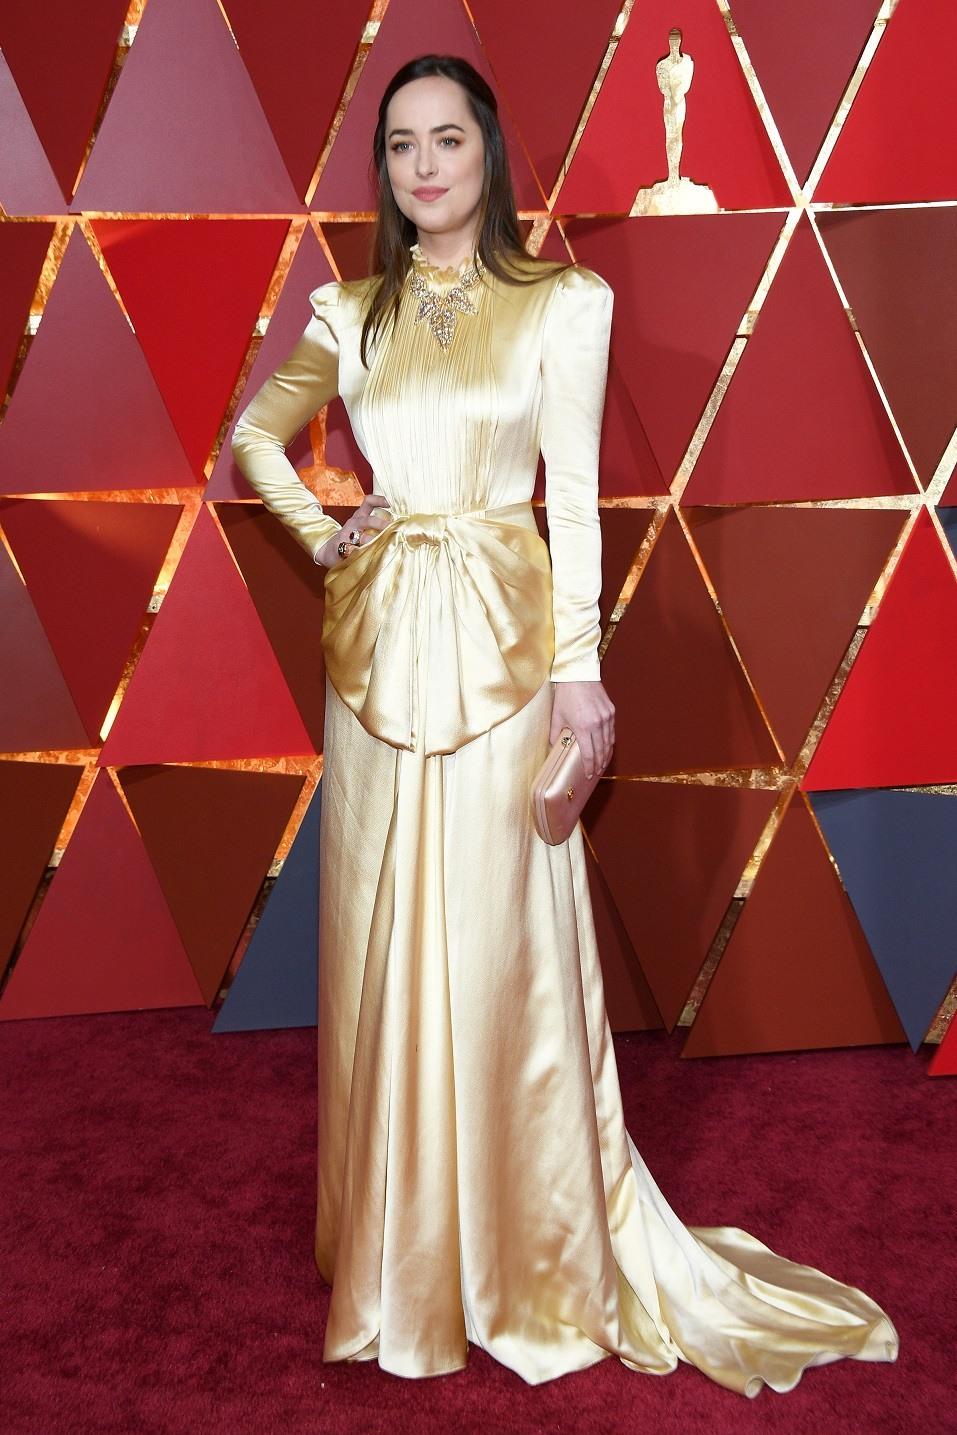 Actor Dakota Johnson attends the 89th Annual Academy Awards